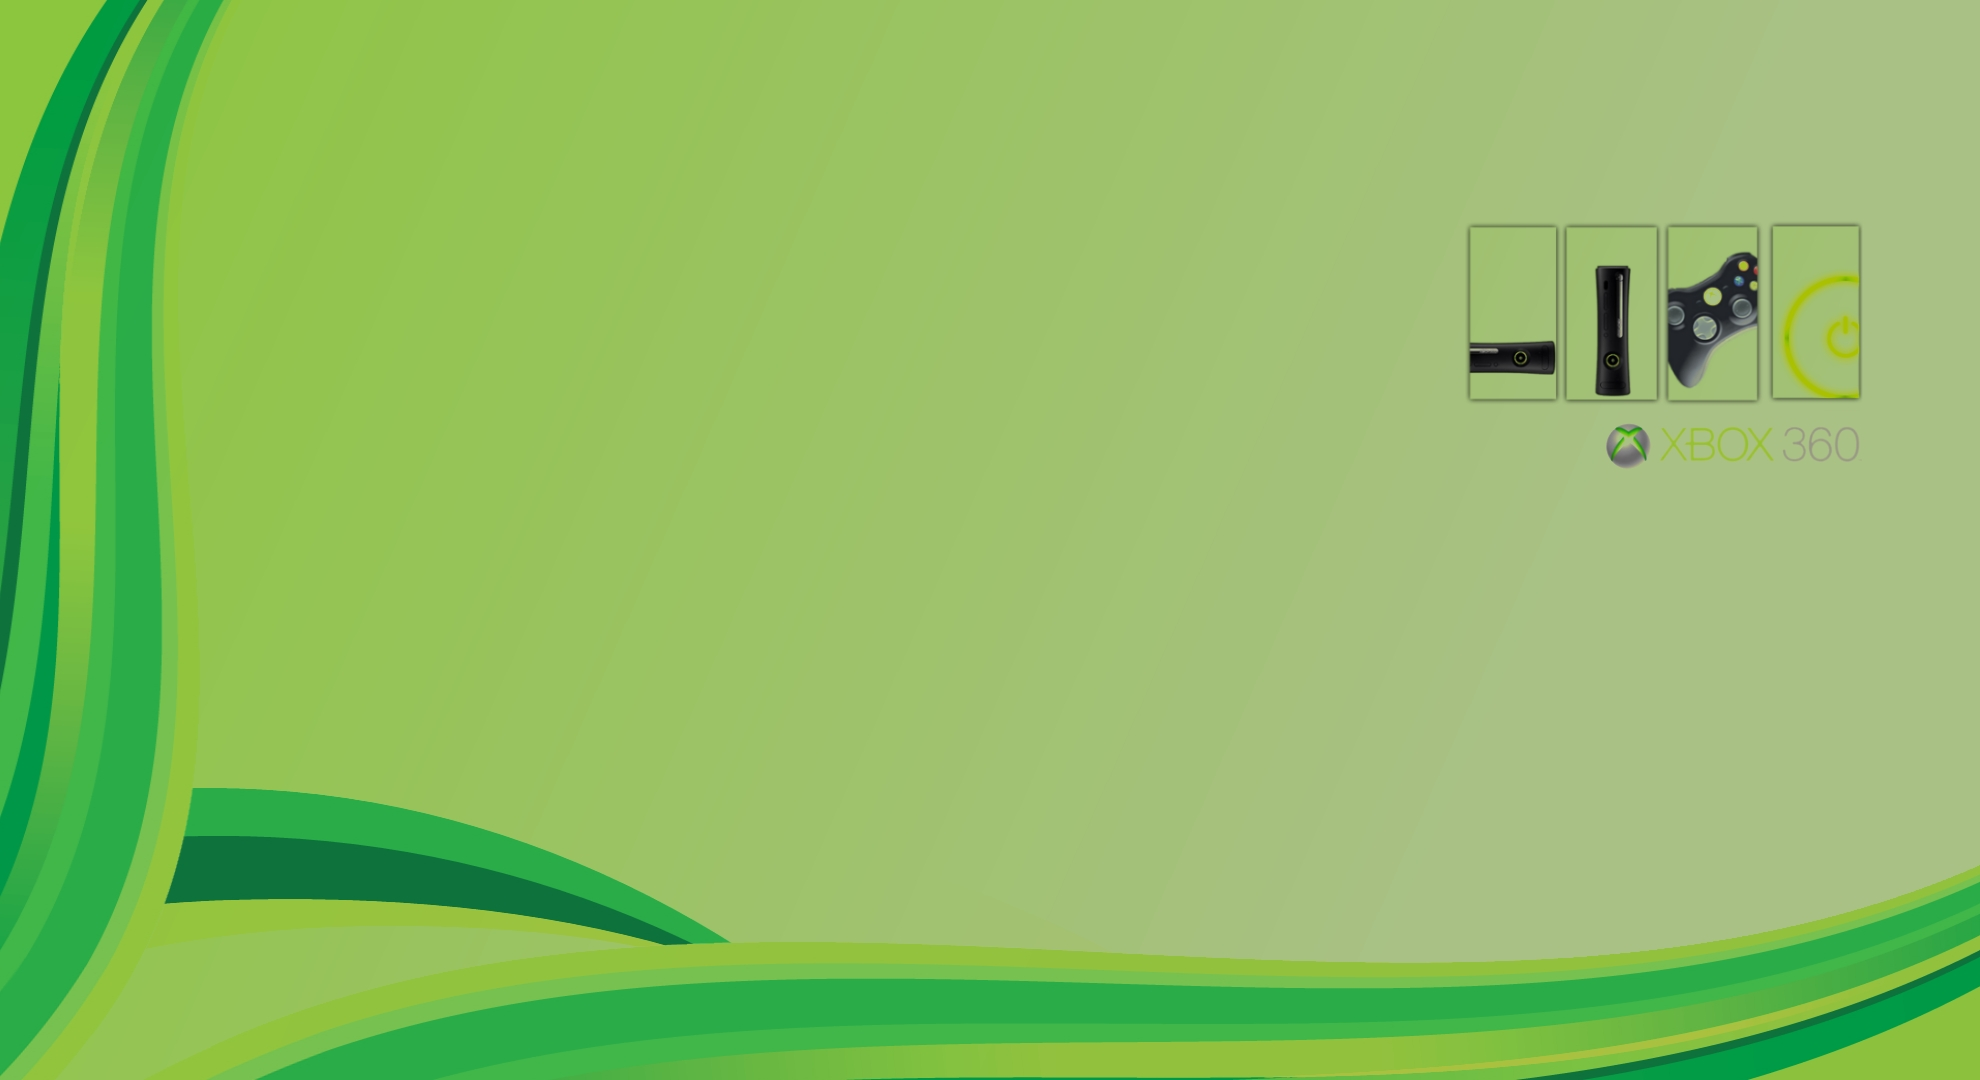 Free Xbox 360 Wallpaper Downloads Wallpapersafari